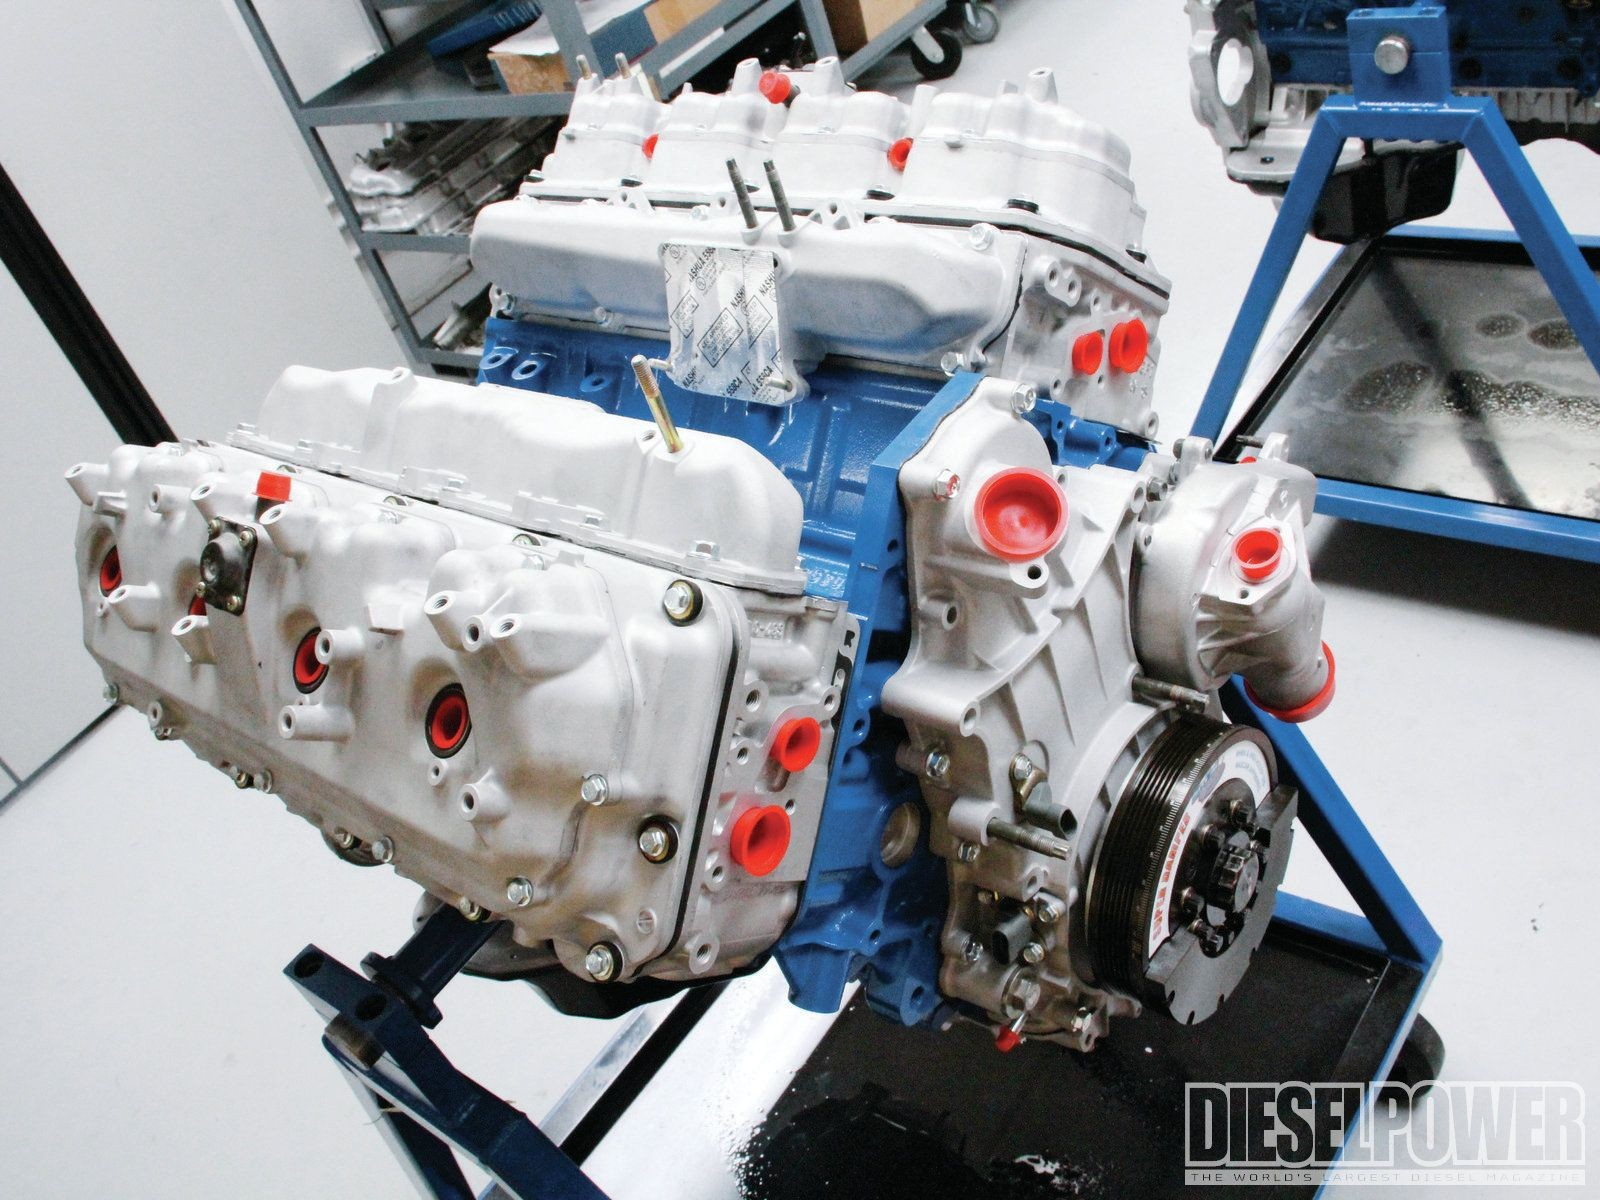 Duramax Diesel Engine Diagram Million Mile Duramax Engine Rebuild & Image  Gallery Of Duramax Diesel Engine